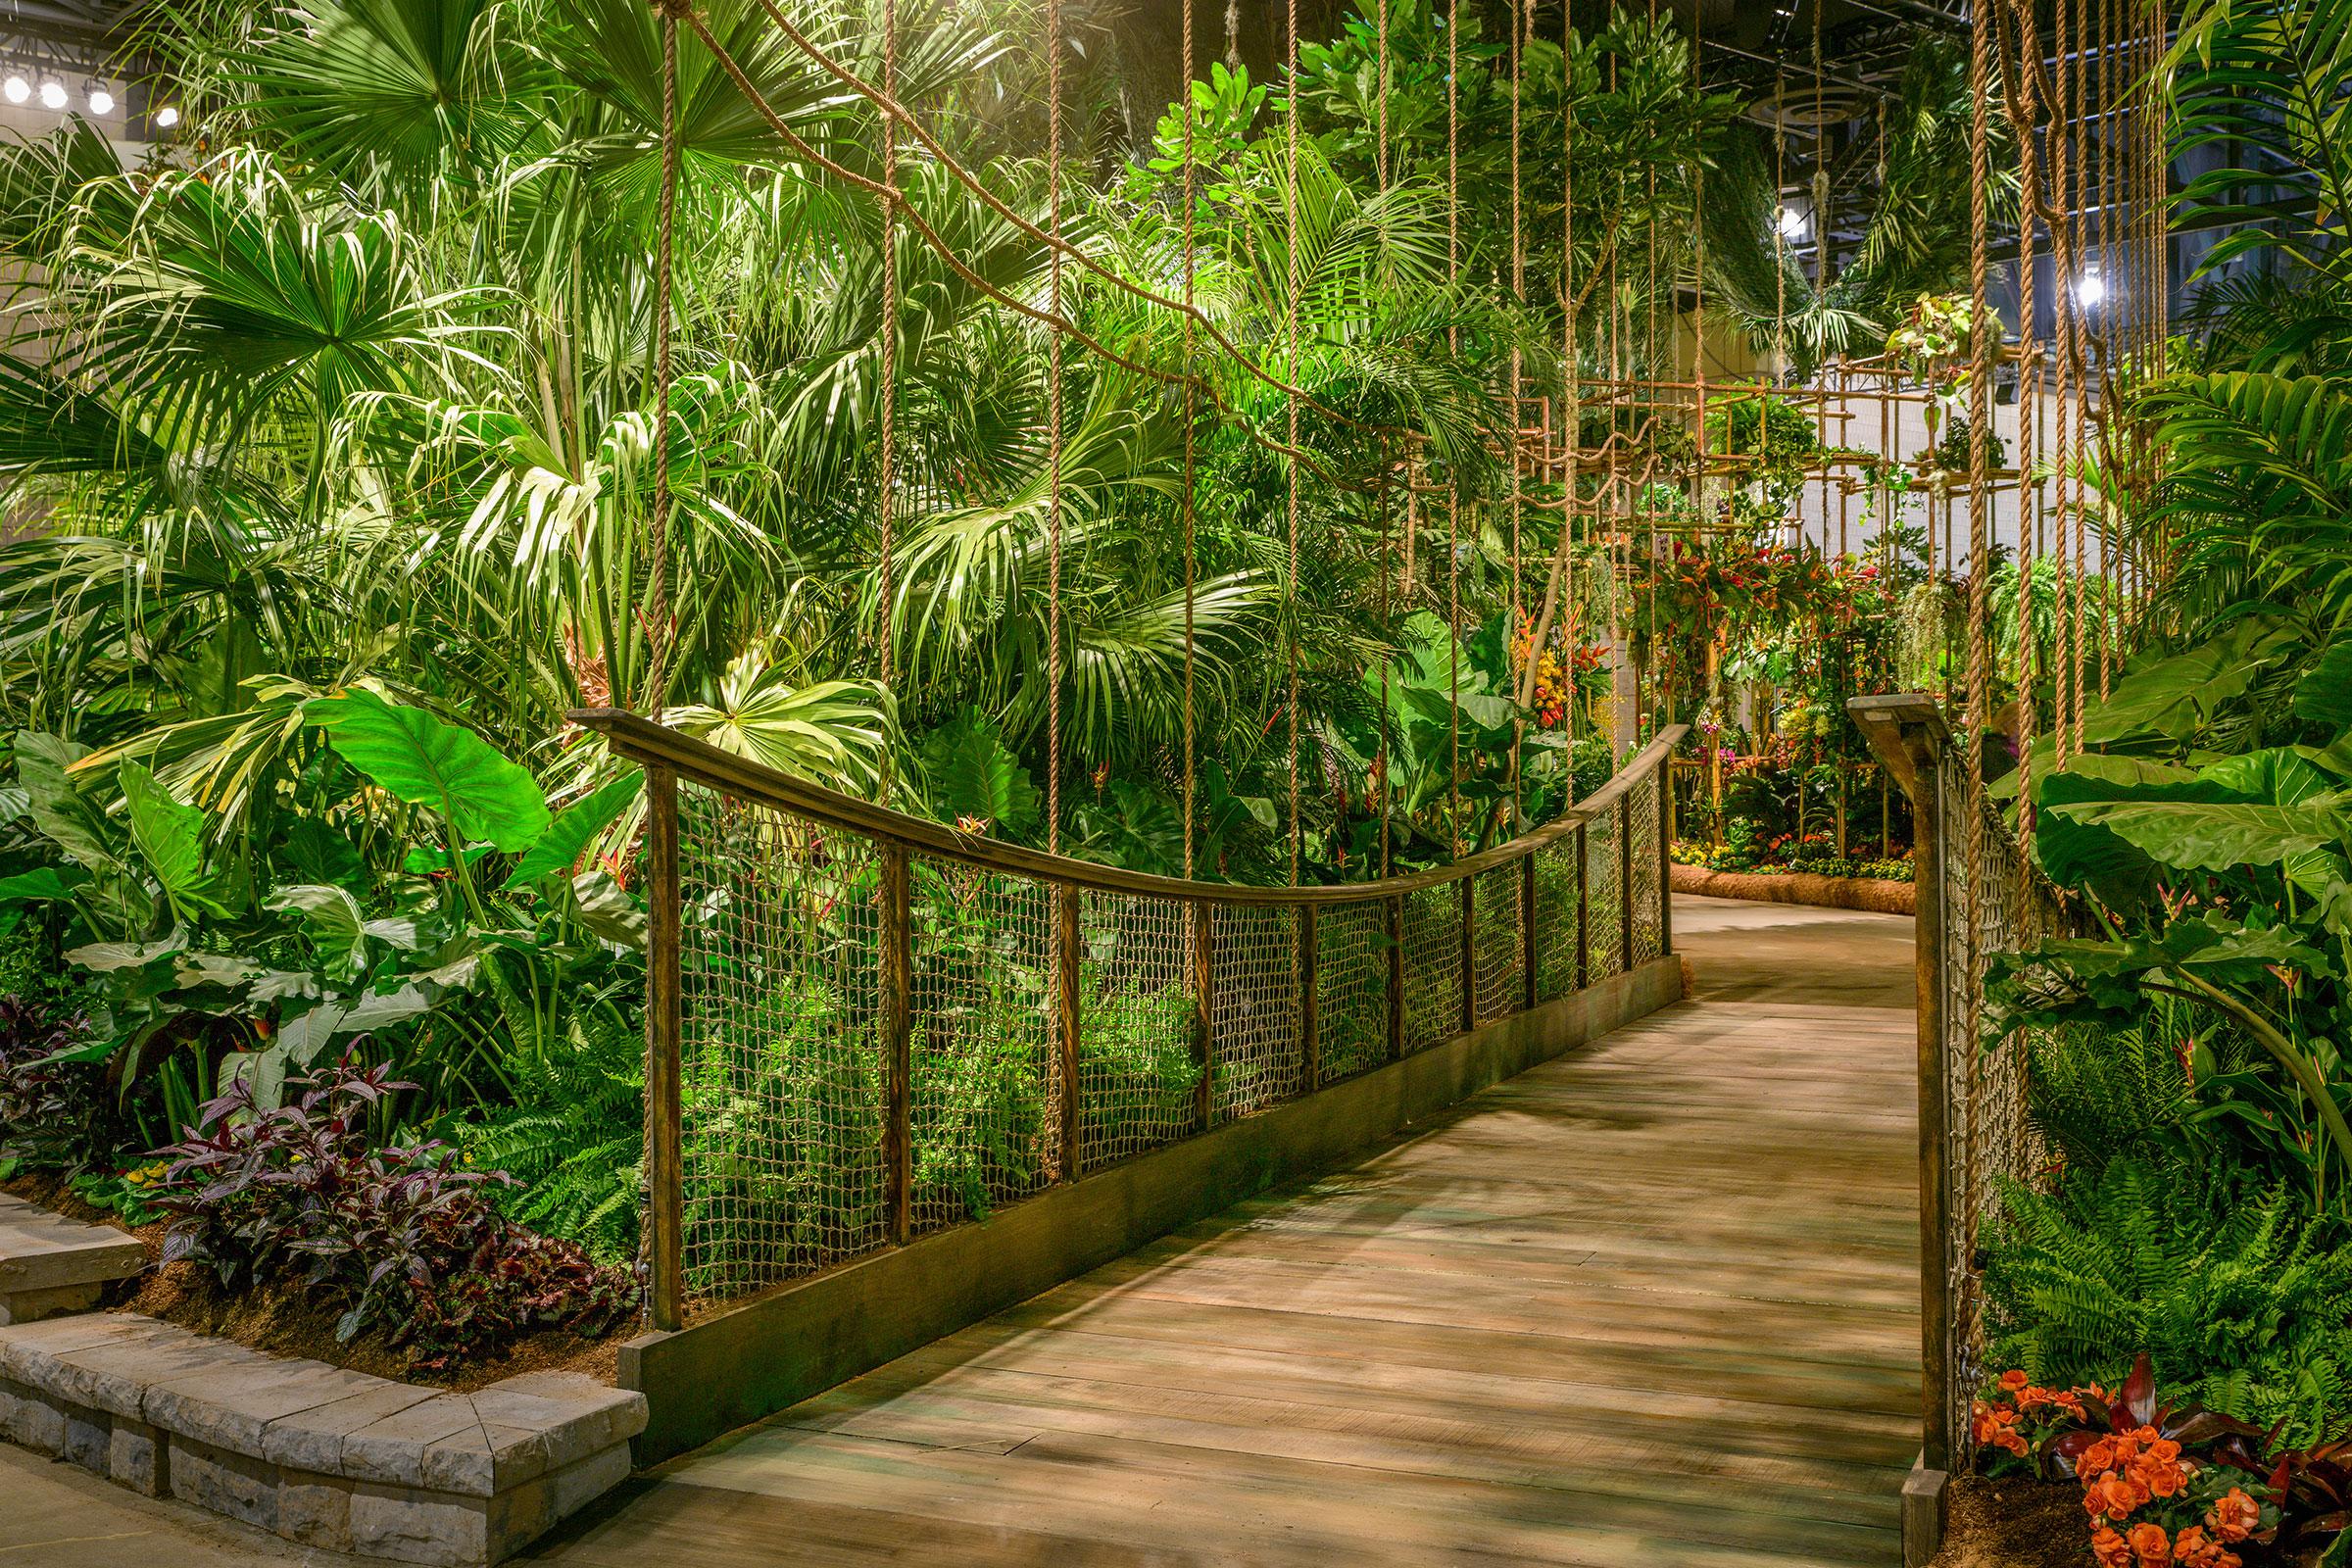 Philadelphia Horticultural Show